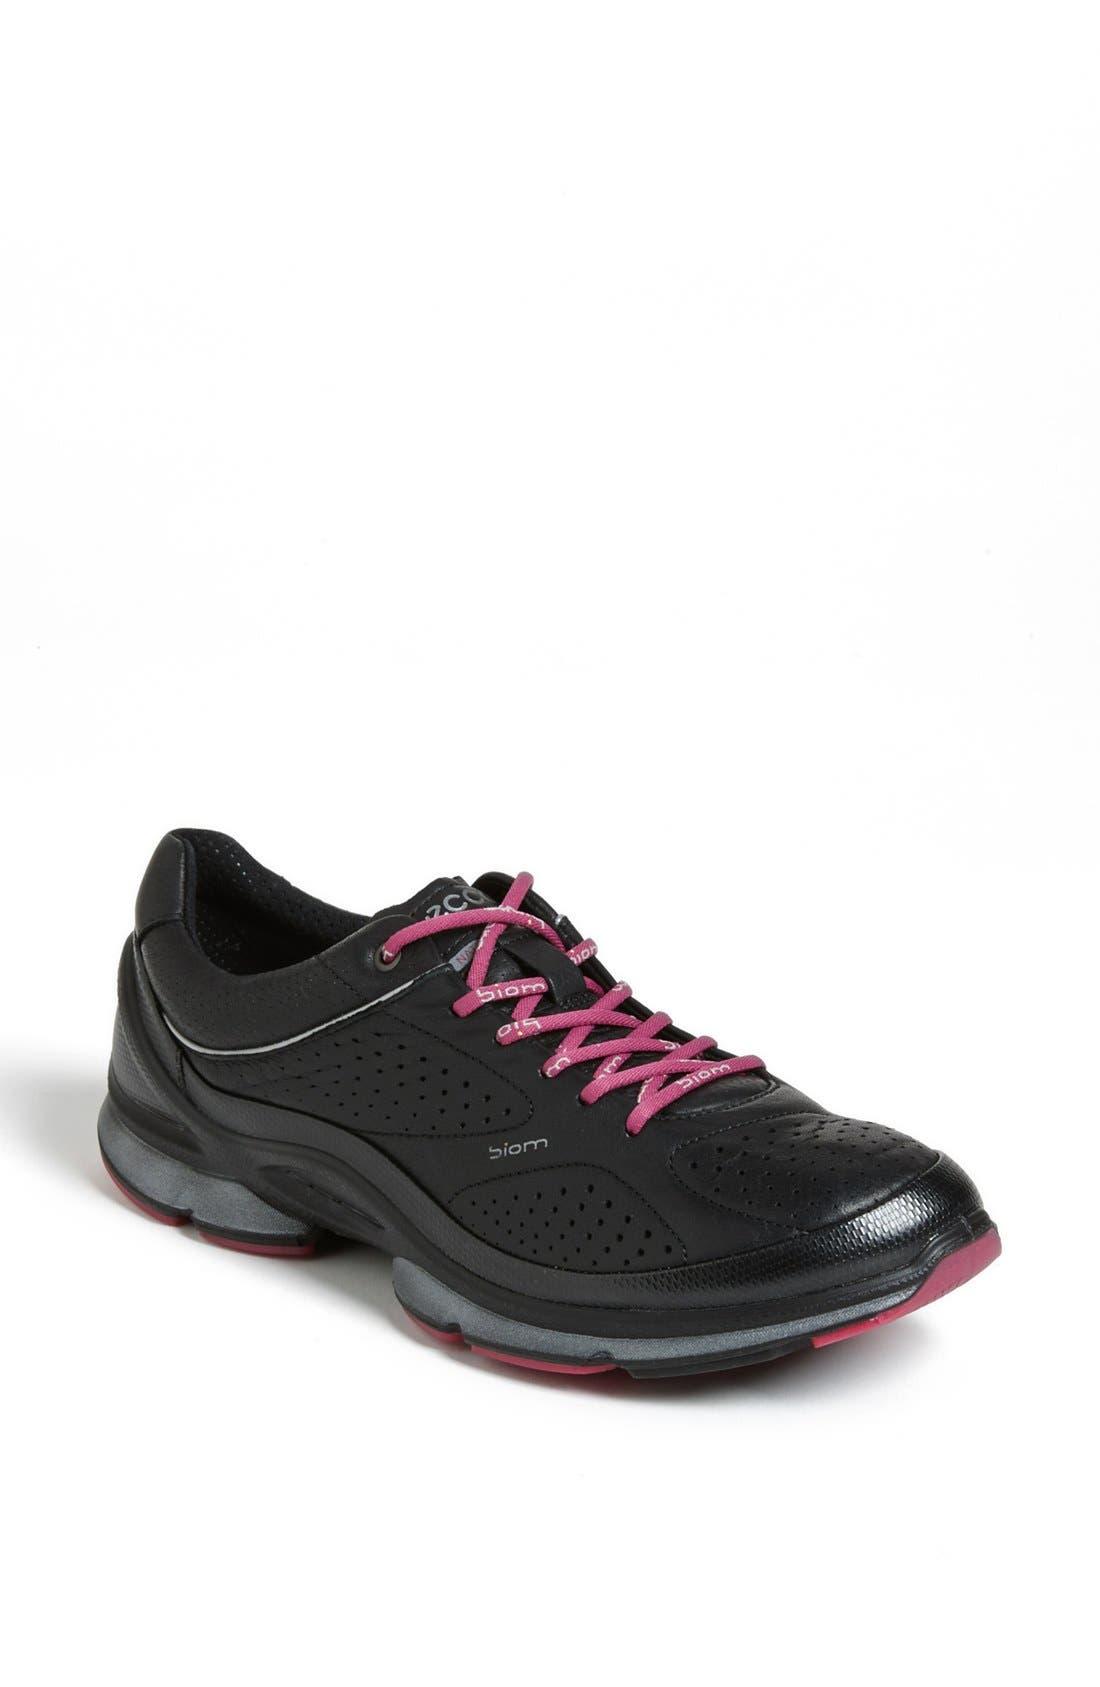 Alternate Image 1 Selected - ECCO 'Biom Evo Trainer Plus' Training Shoe (Women)